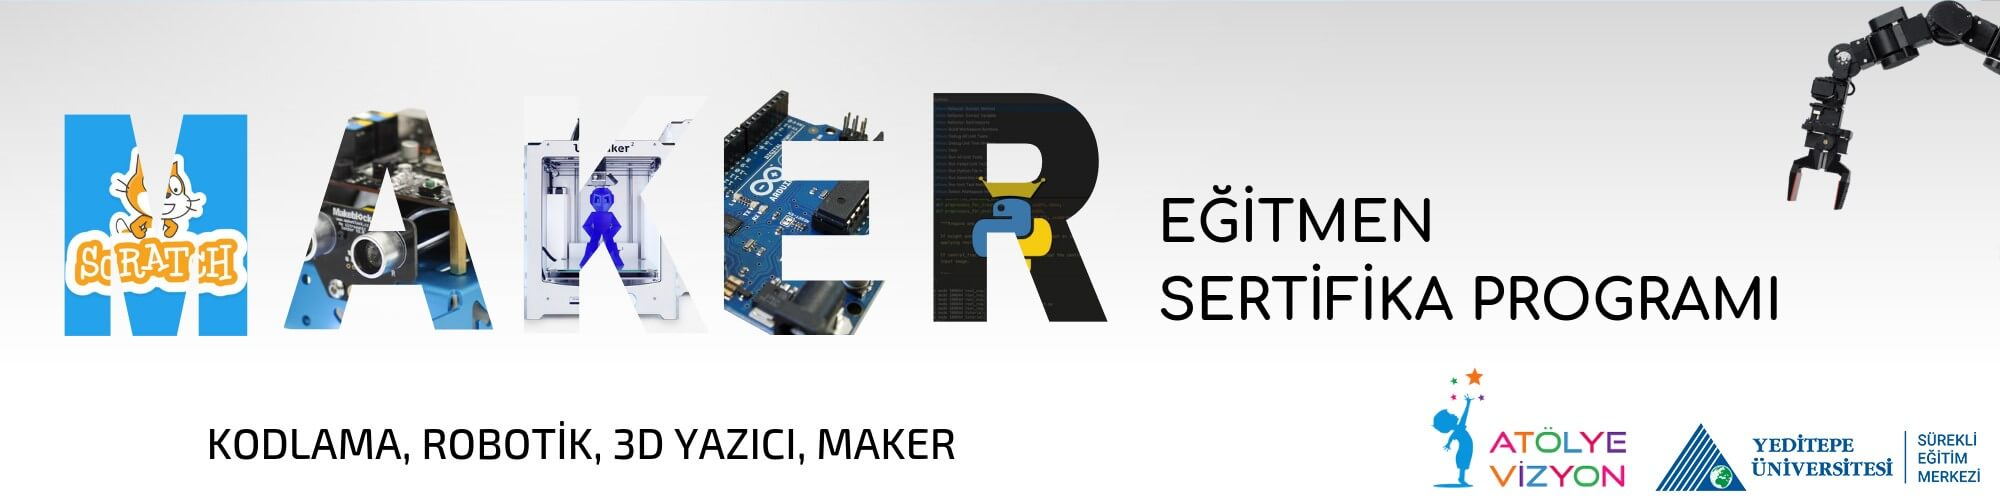 kodloma-robotik-maker-egitimi